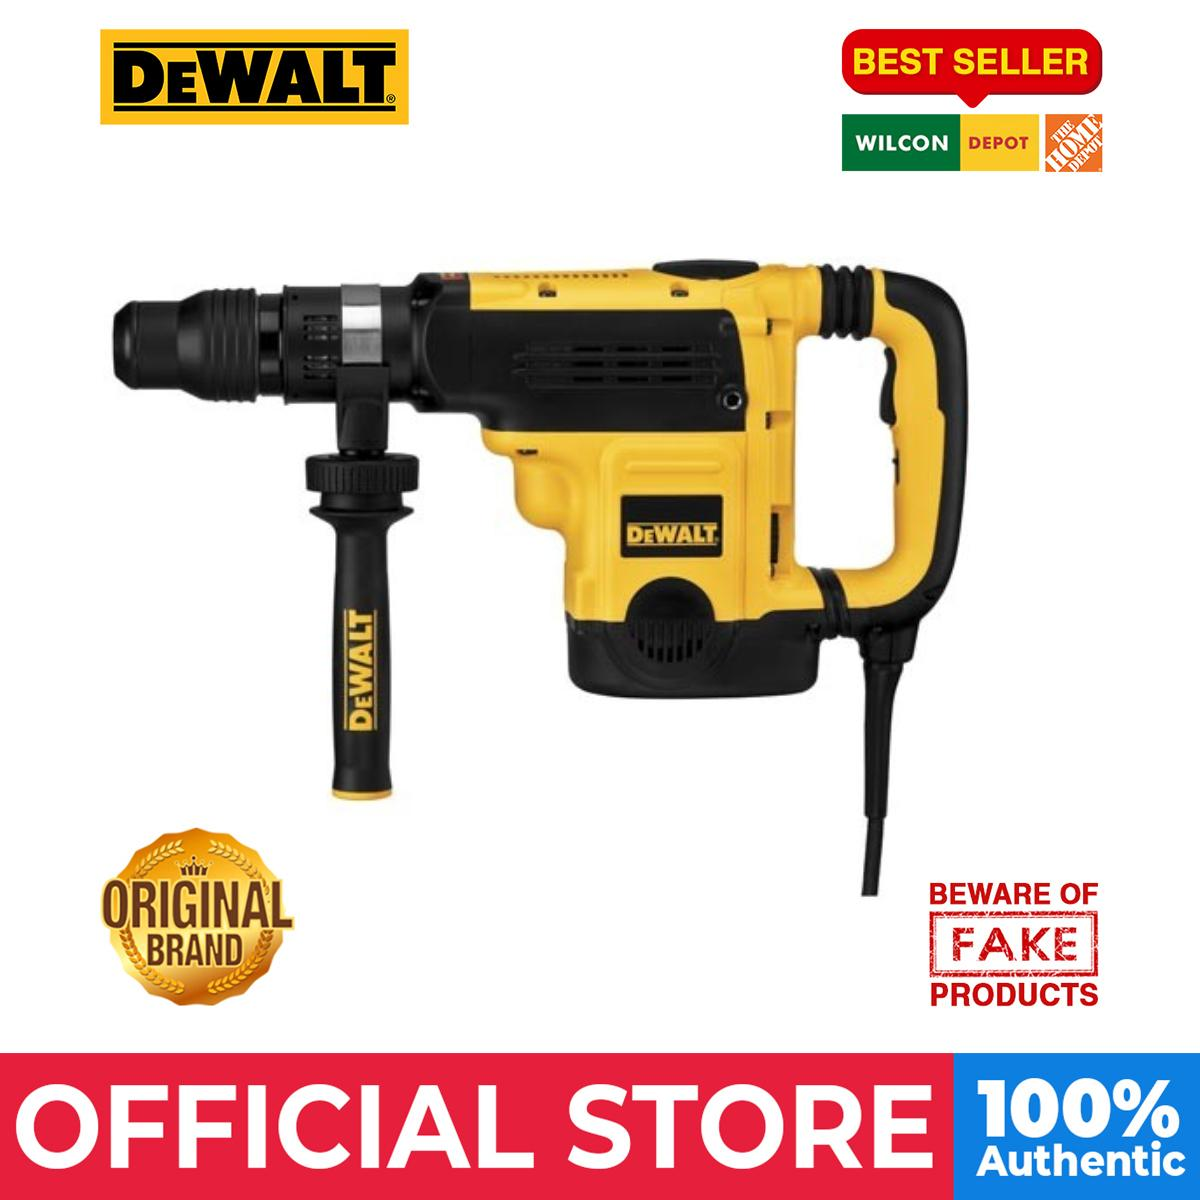 DeWALT SDS Max Rotary Hammer with Shocks (D25721K)